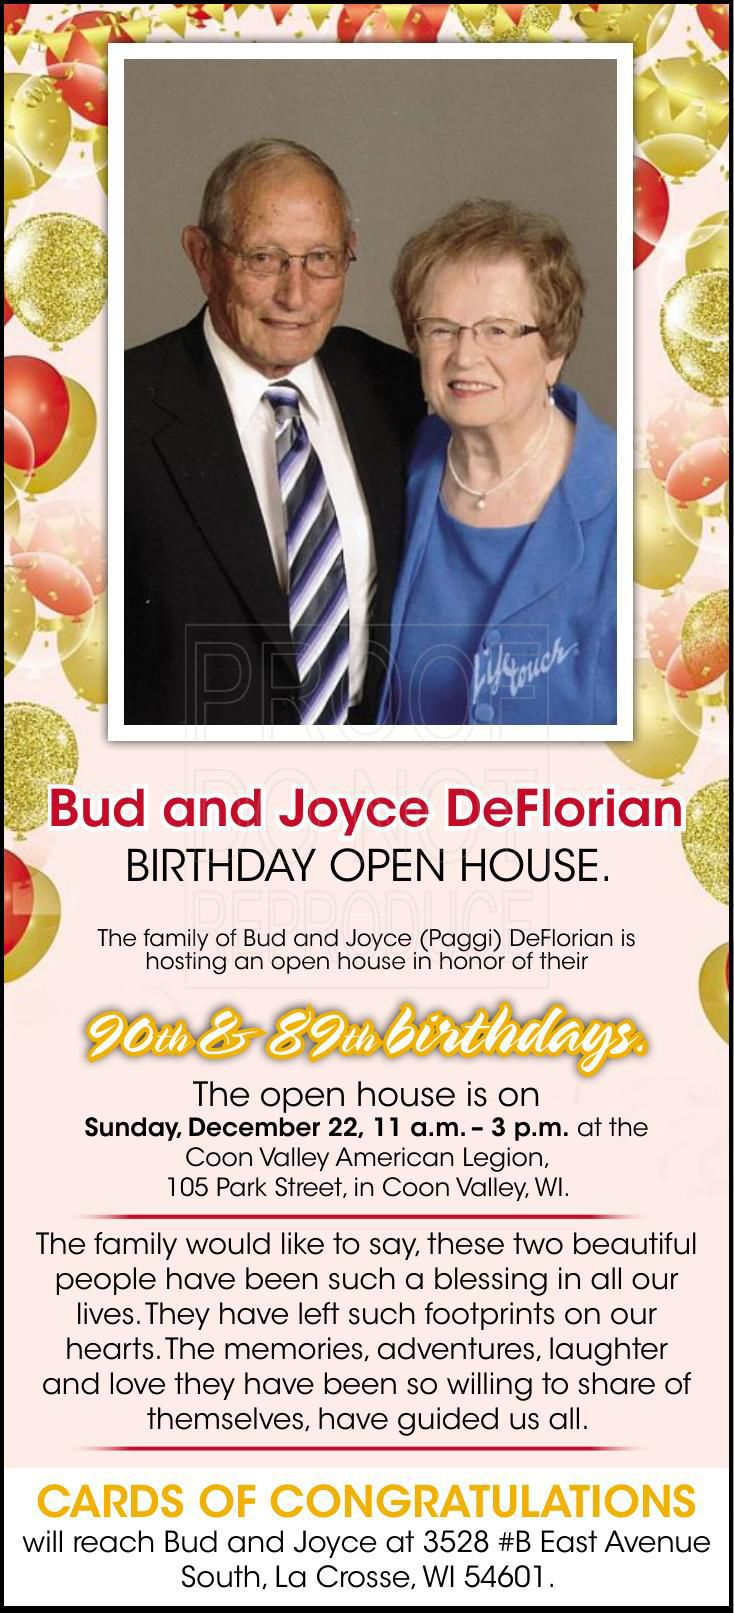 Bud and Joyce DeFlorian